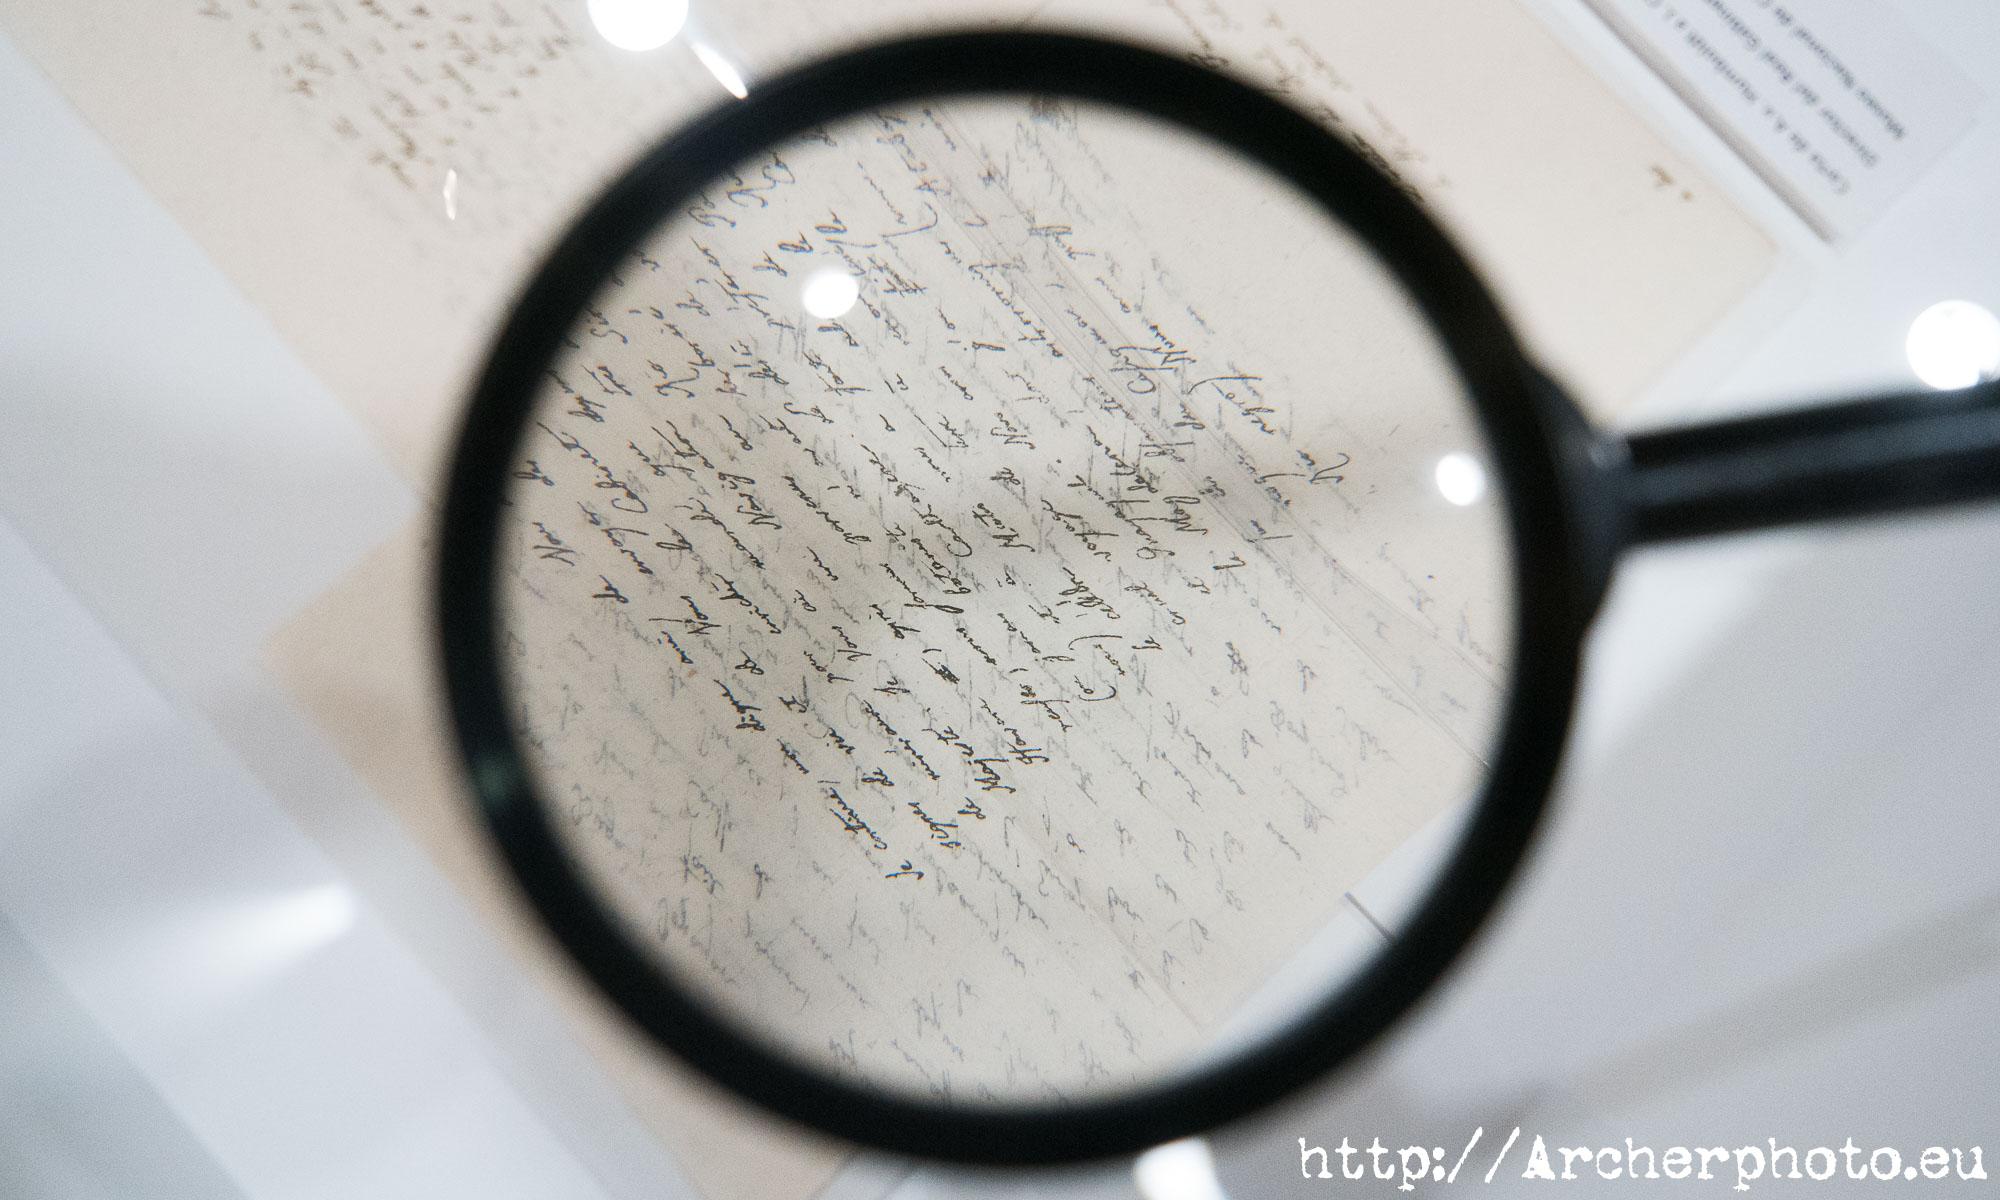 Carta de Alexander Von Humboldt